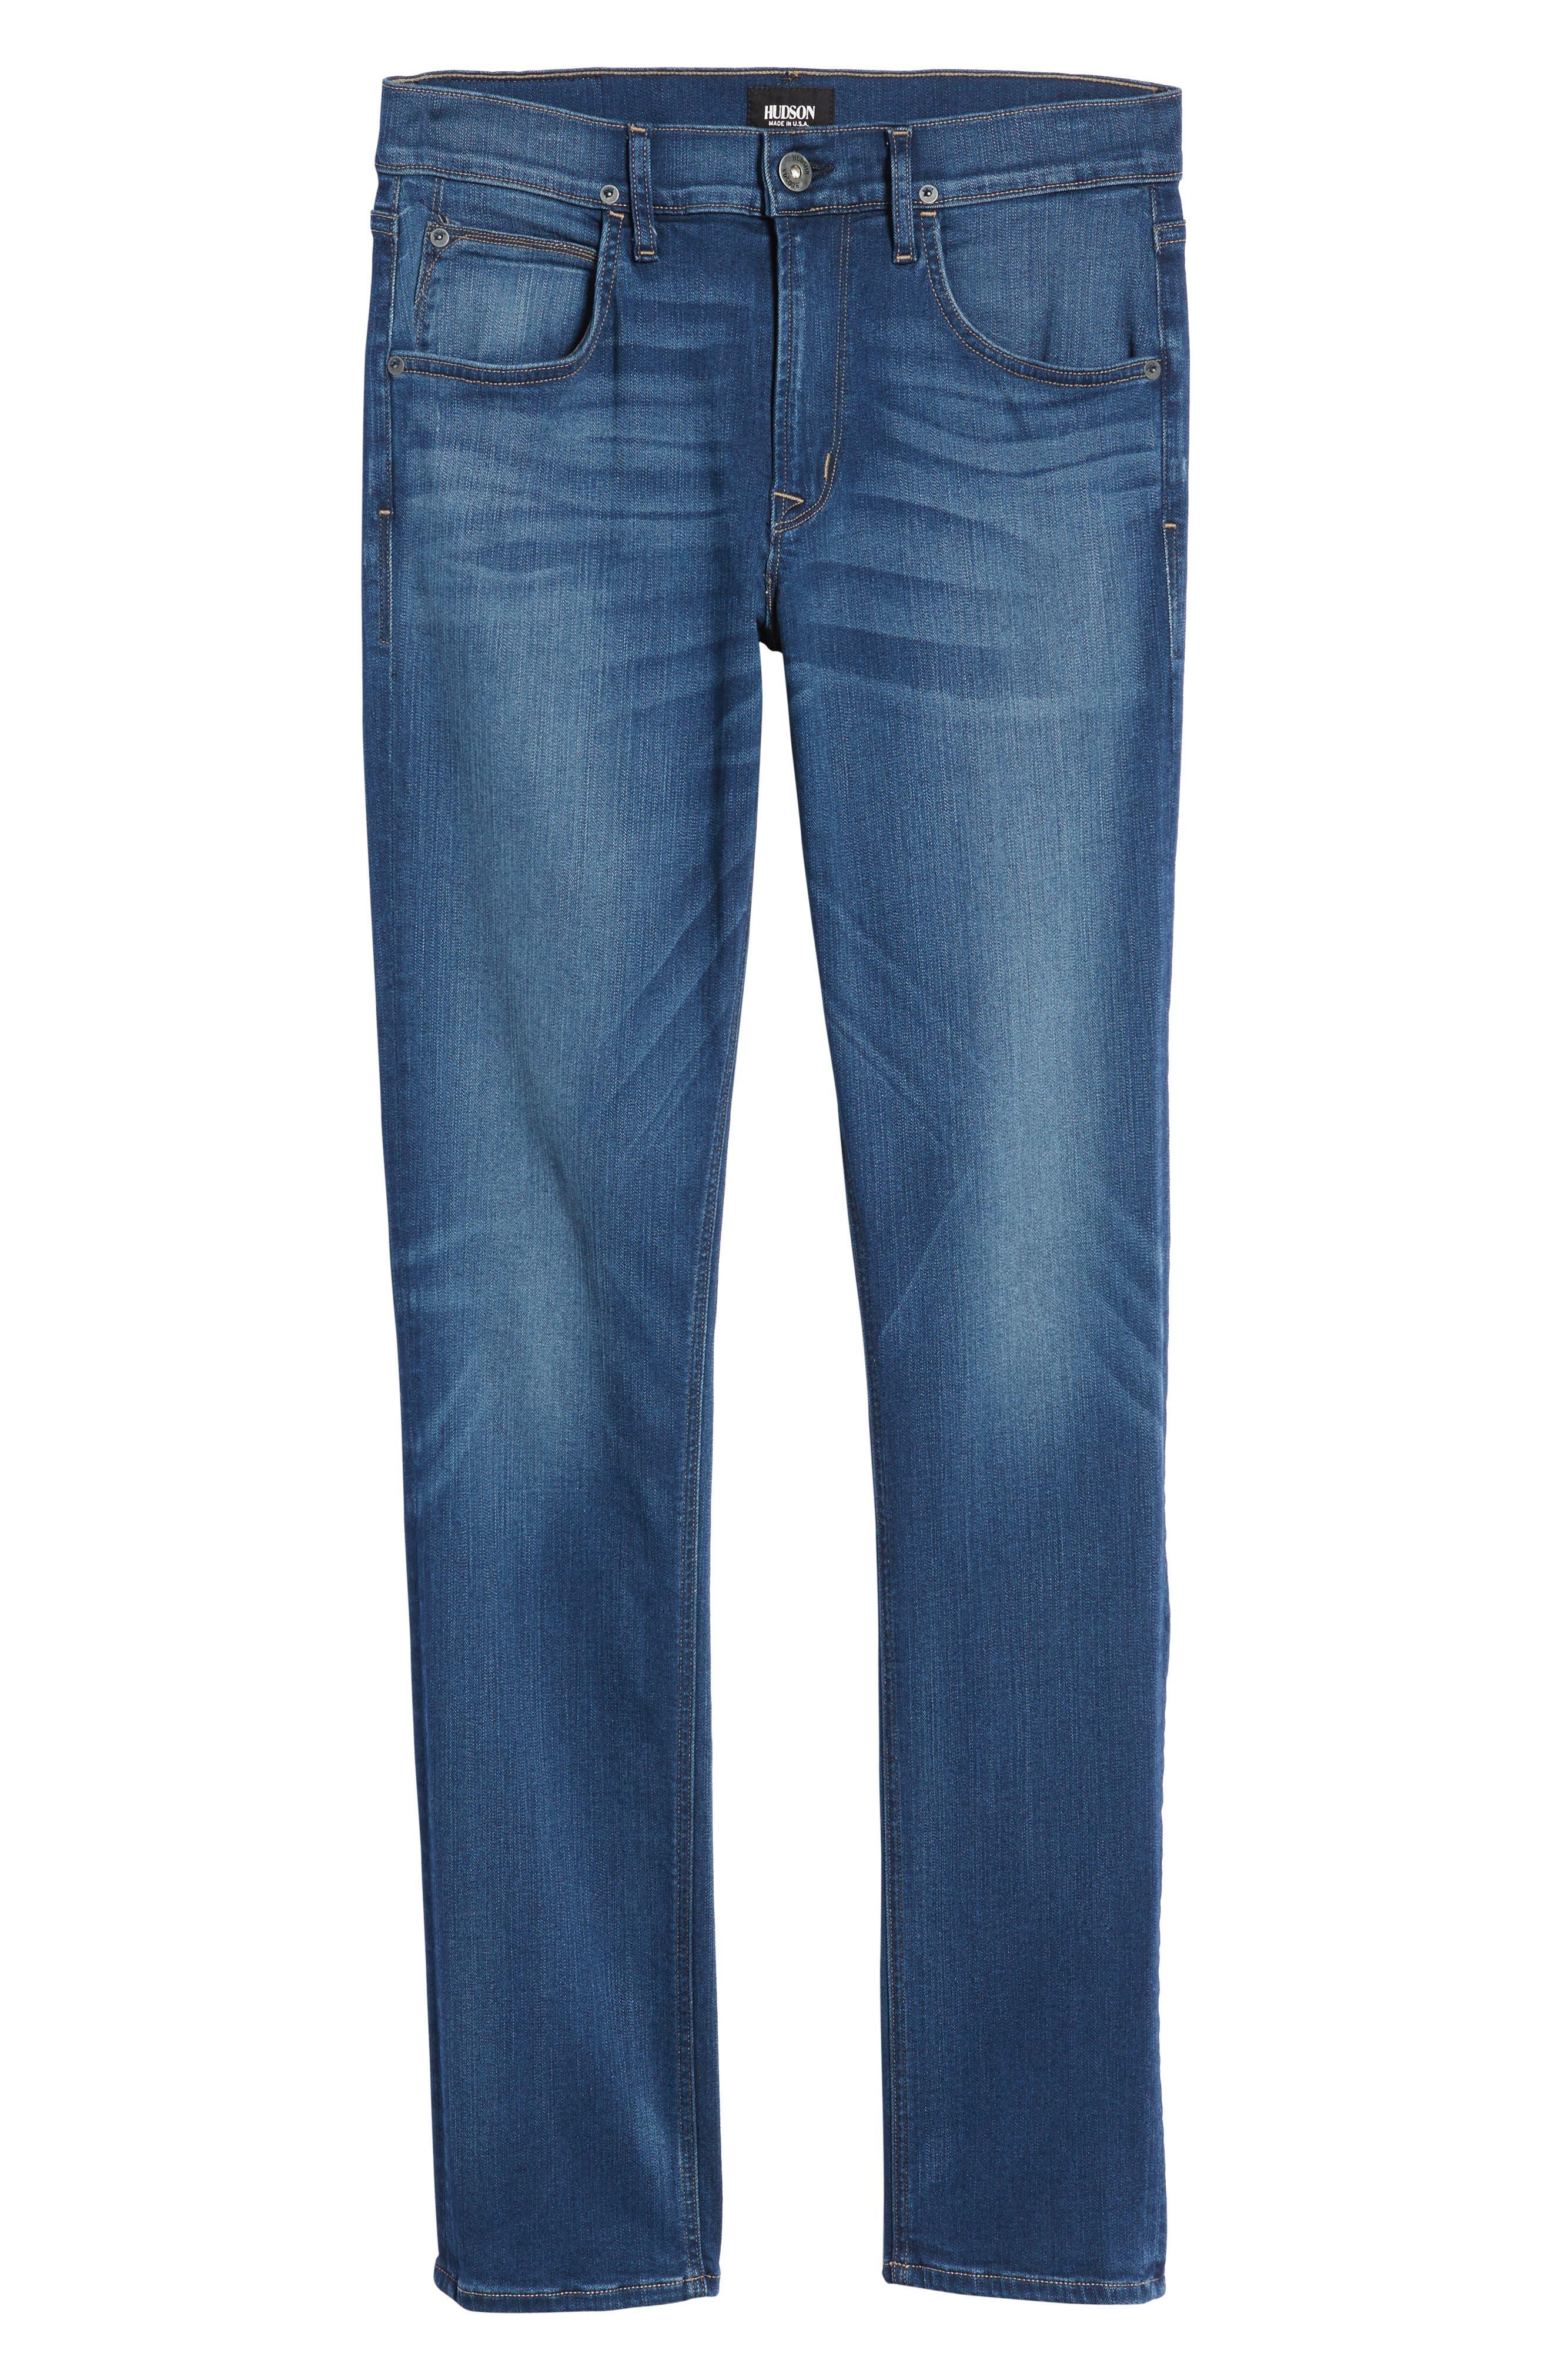 Hudson Blake Slim Fit Jeans,                             Alternate thumbnail 6, color,                             421